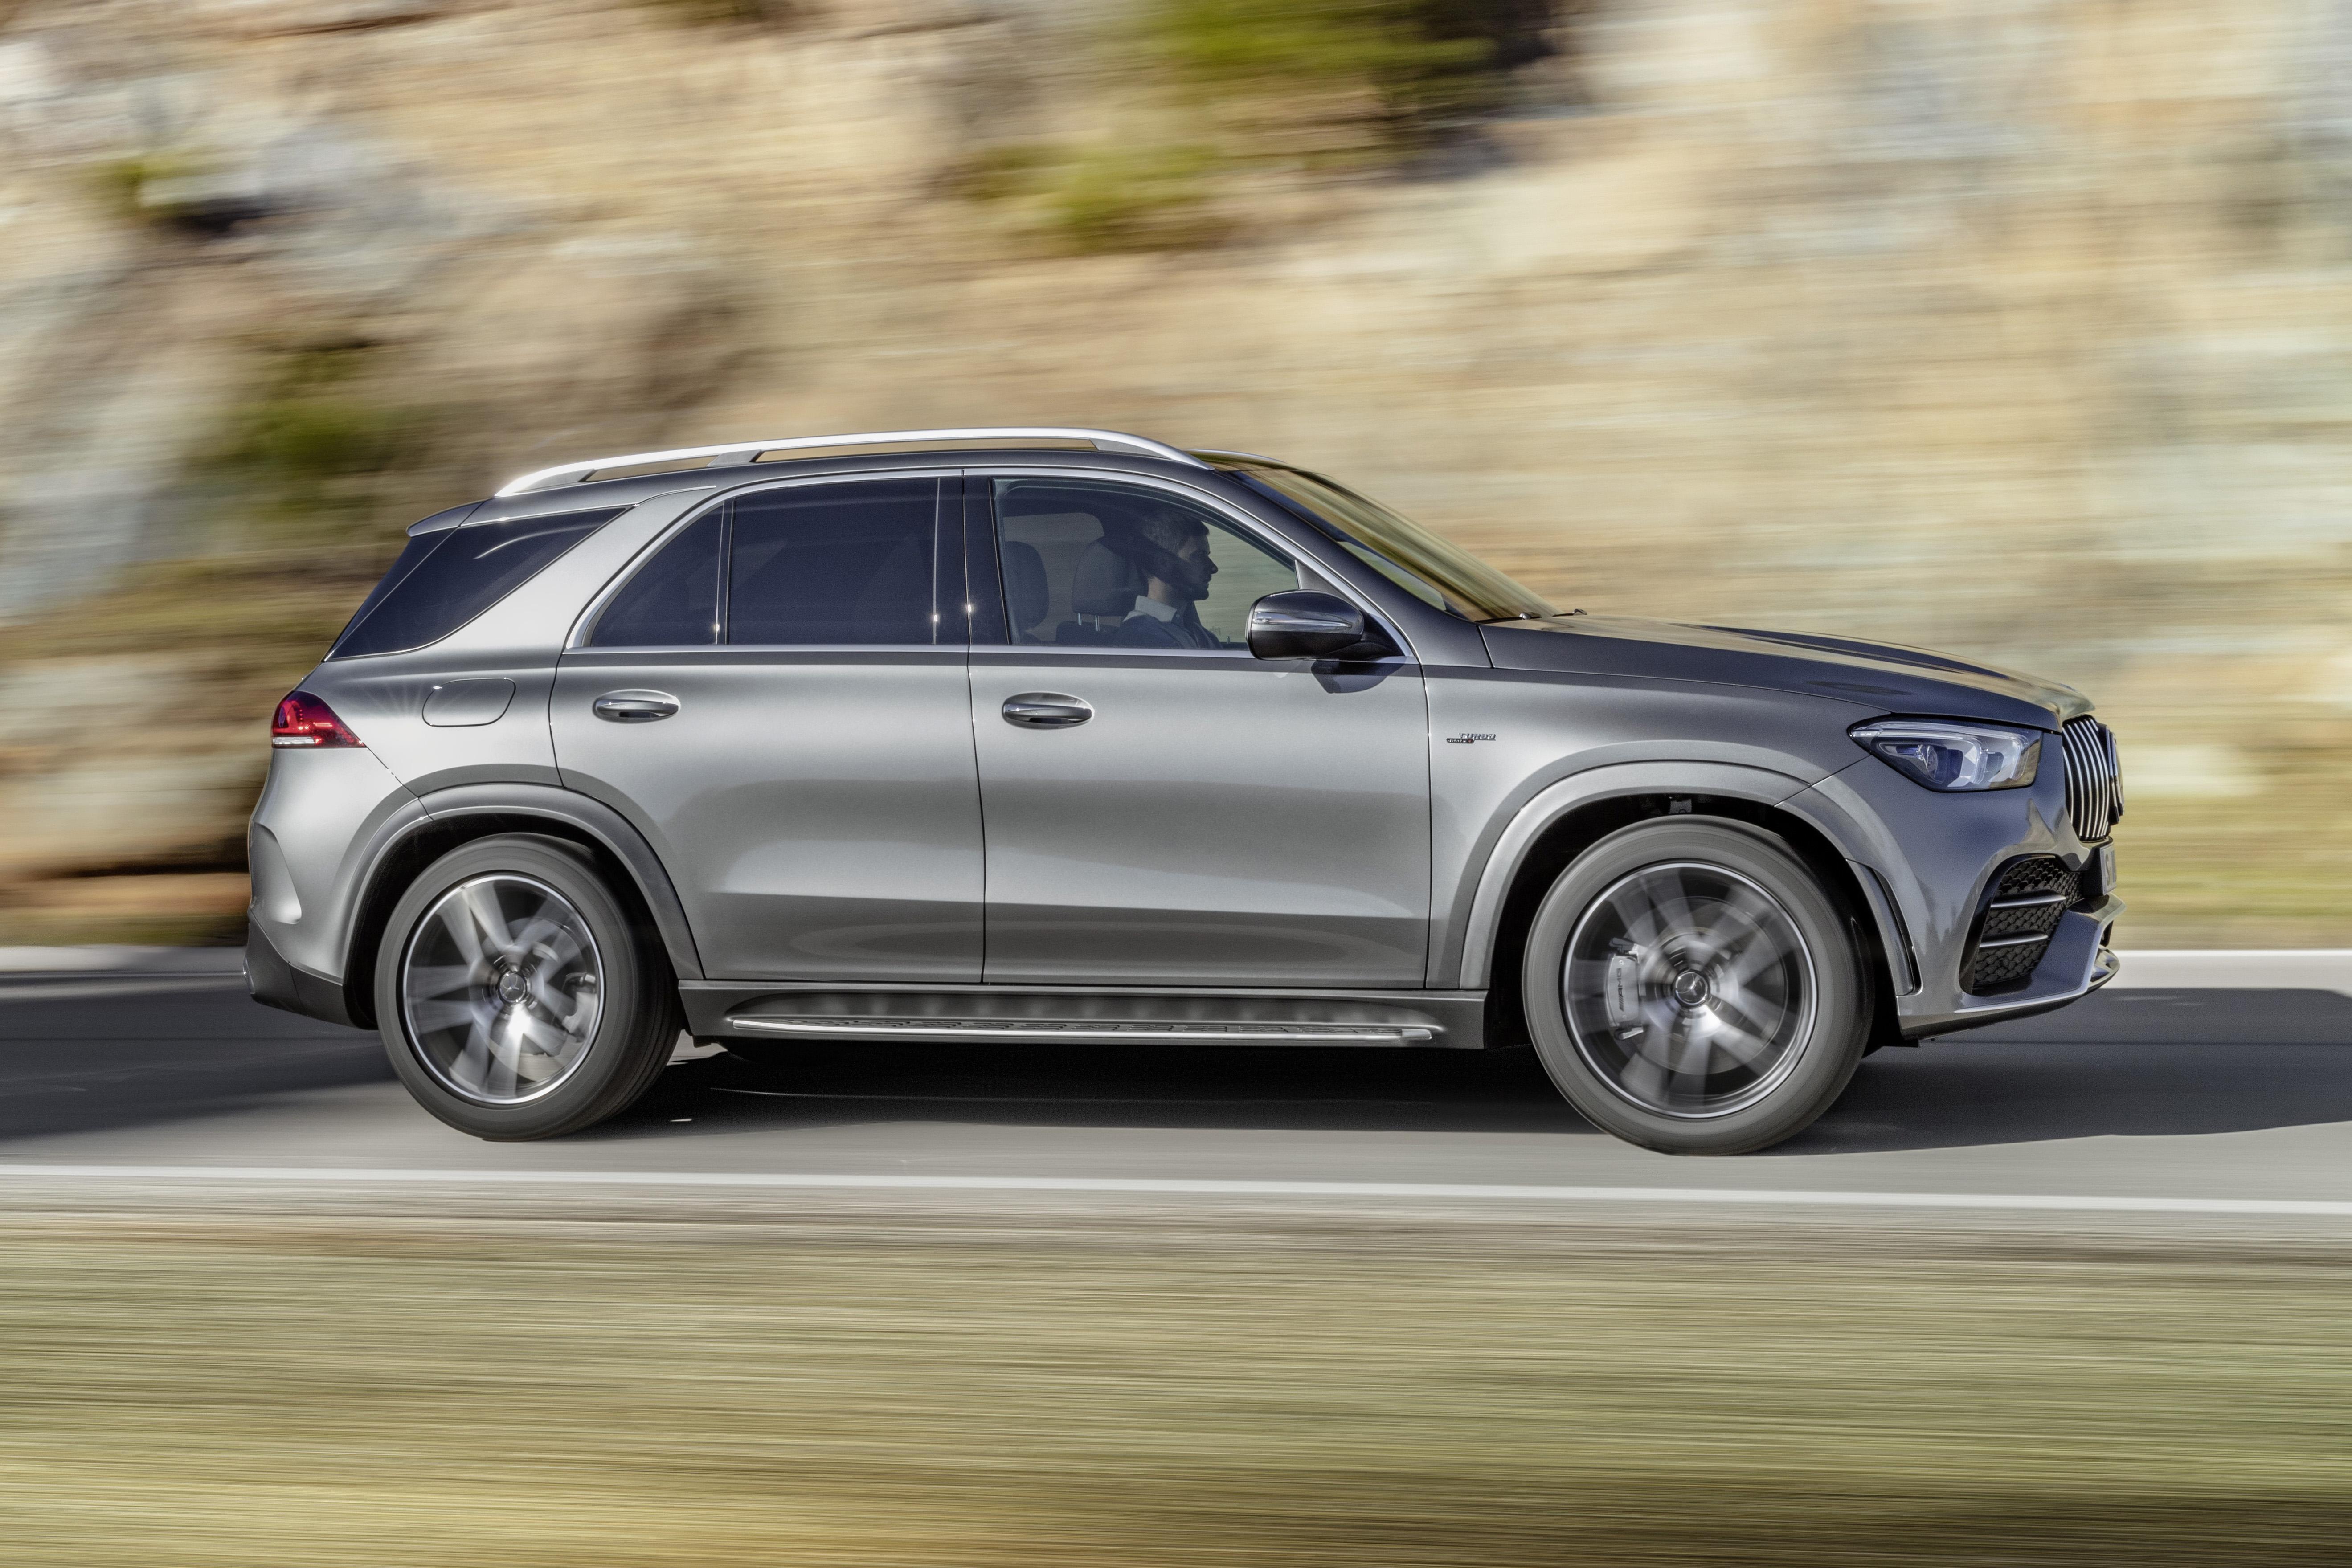 2019-20 Mercedes-Benz GLE recalled